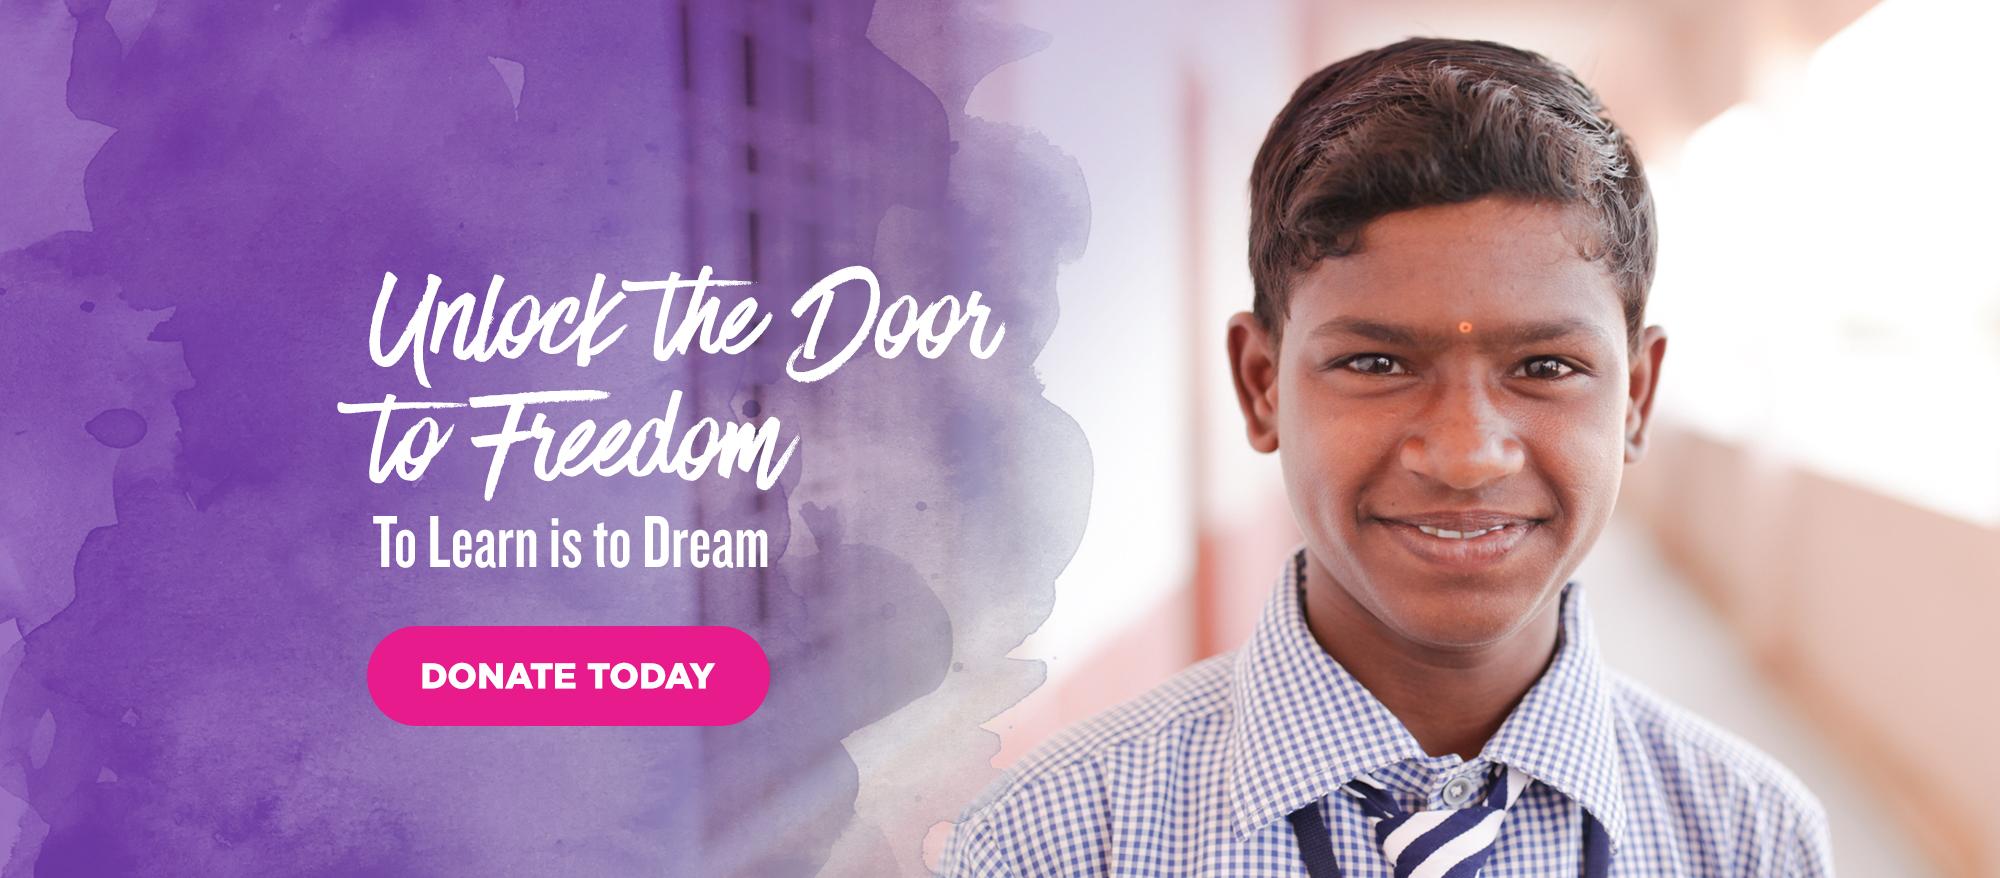 DFN-Freedom-Campaign-2018-Home.jpg